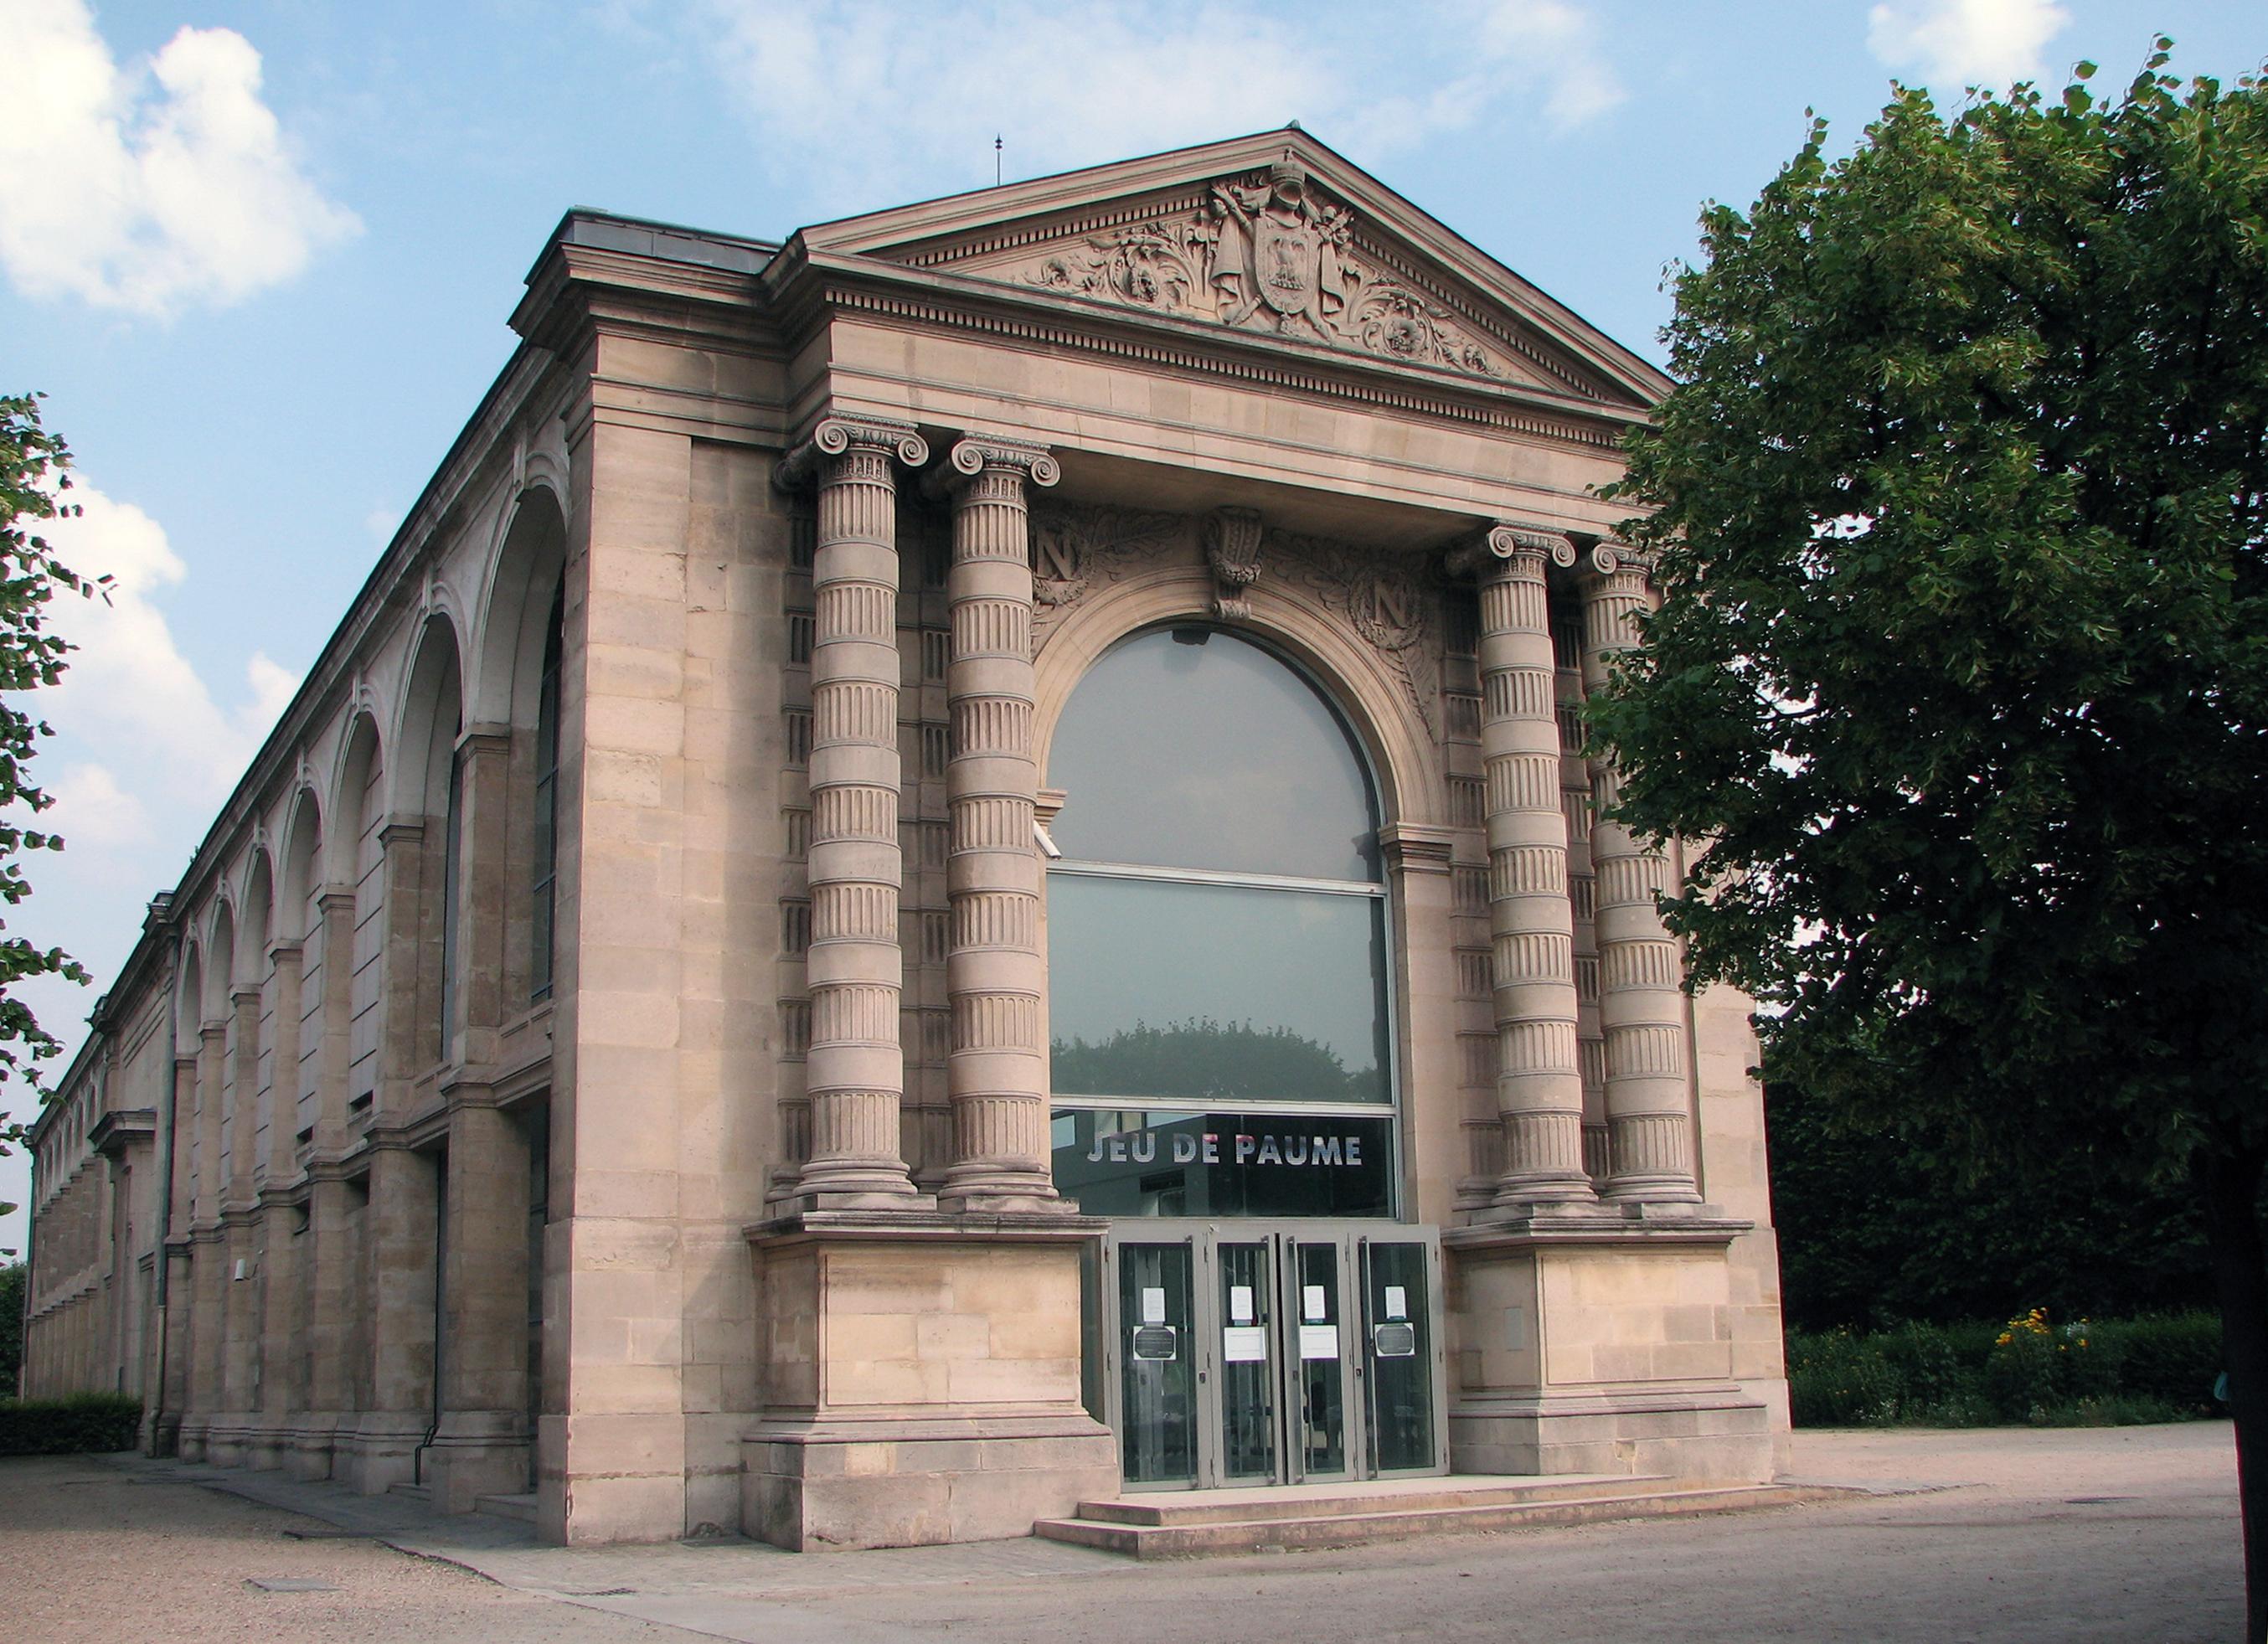 Galerie nationale du Jeu de Paume - Wikipedia